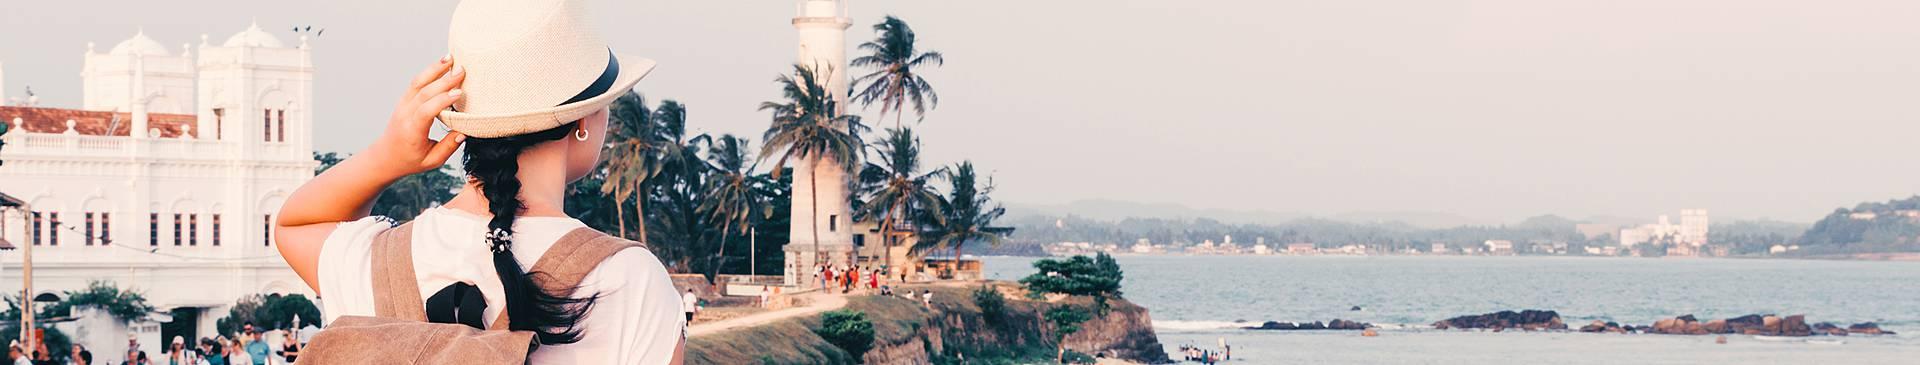 Solo holidays in Sri Lanka